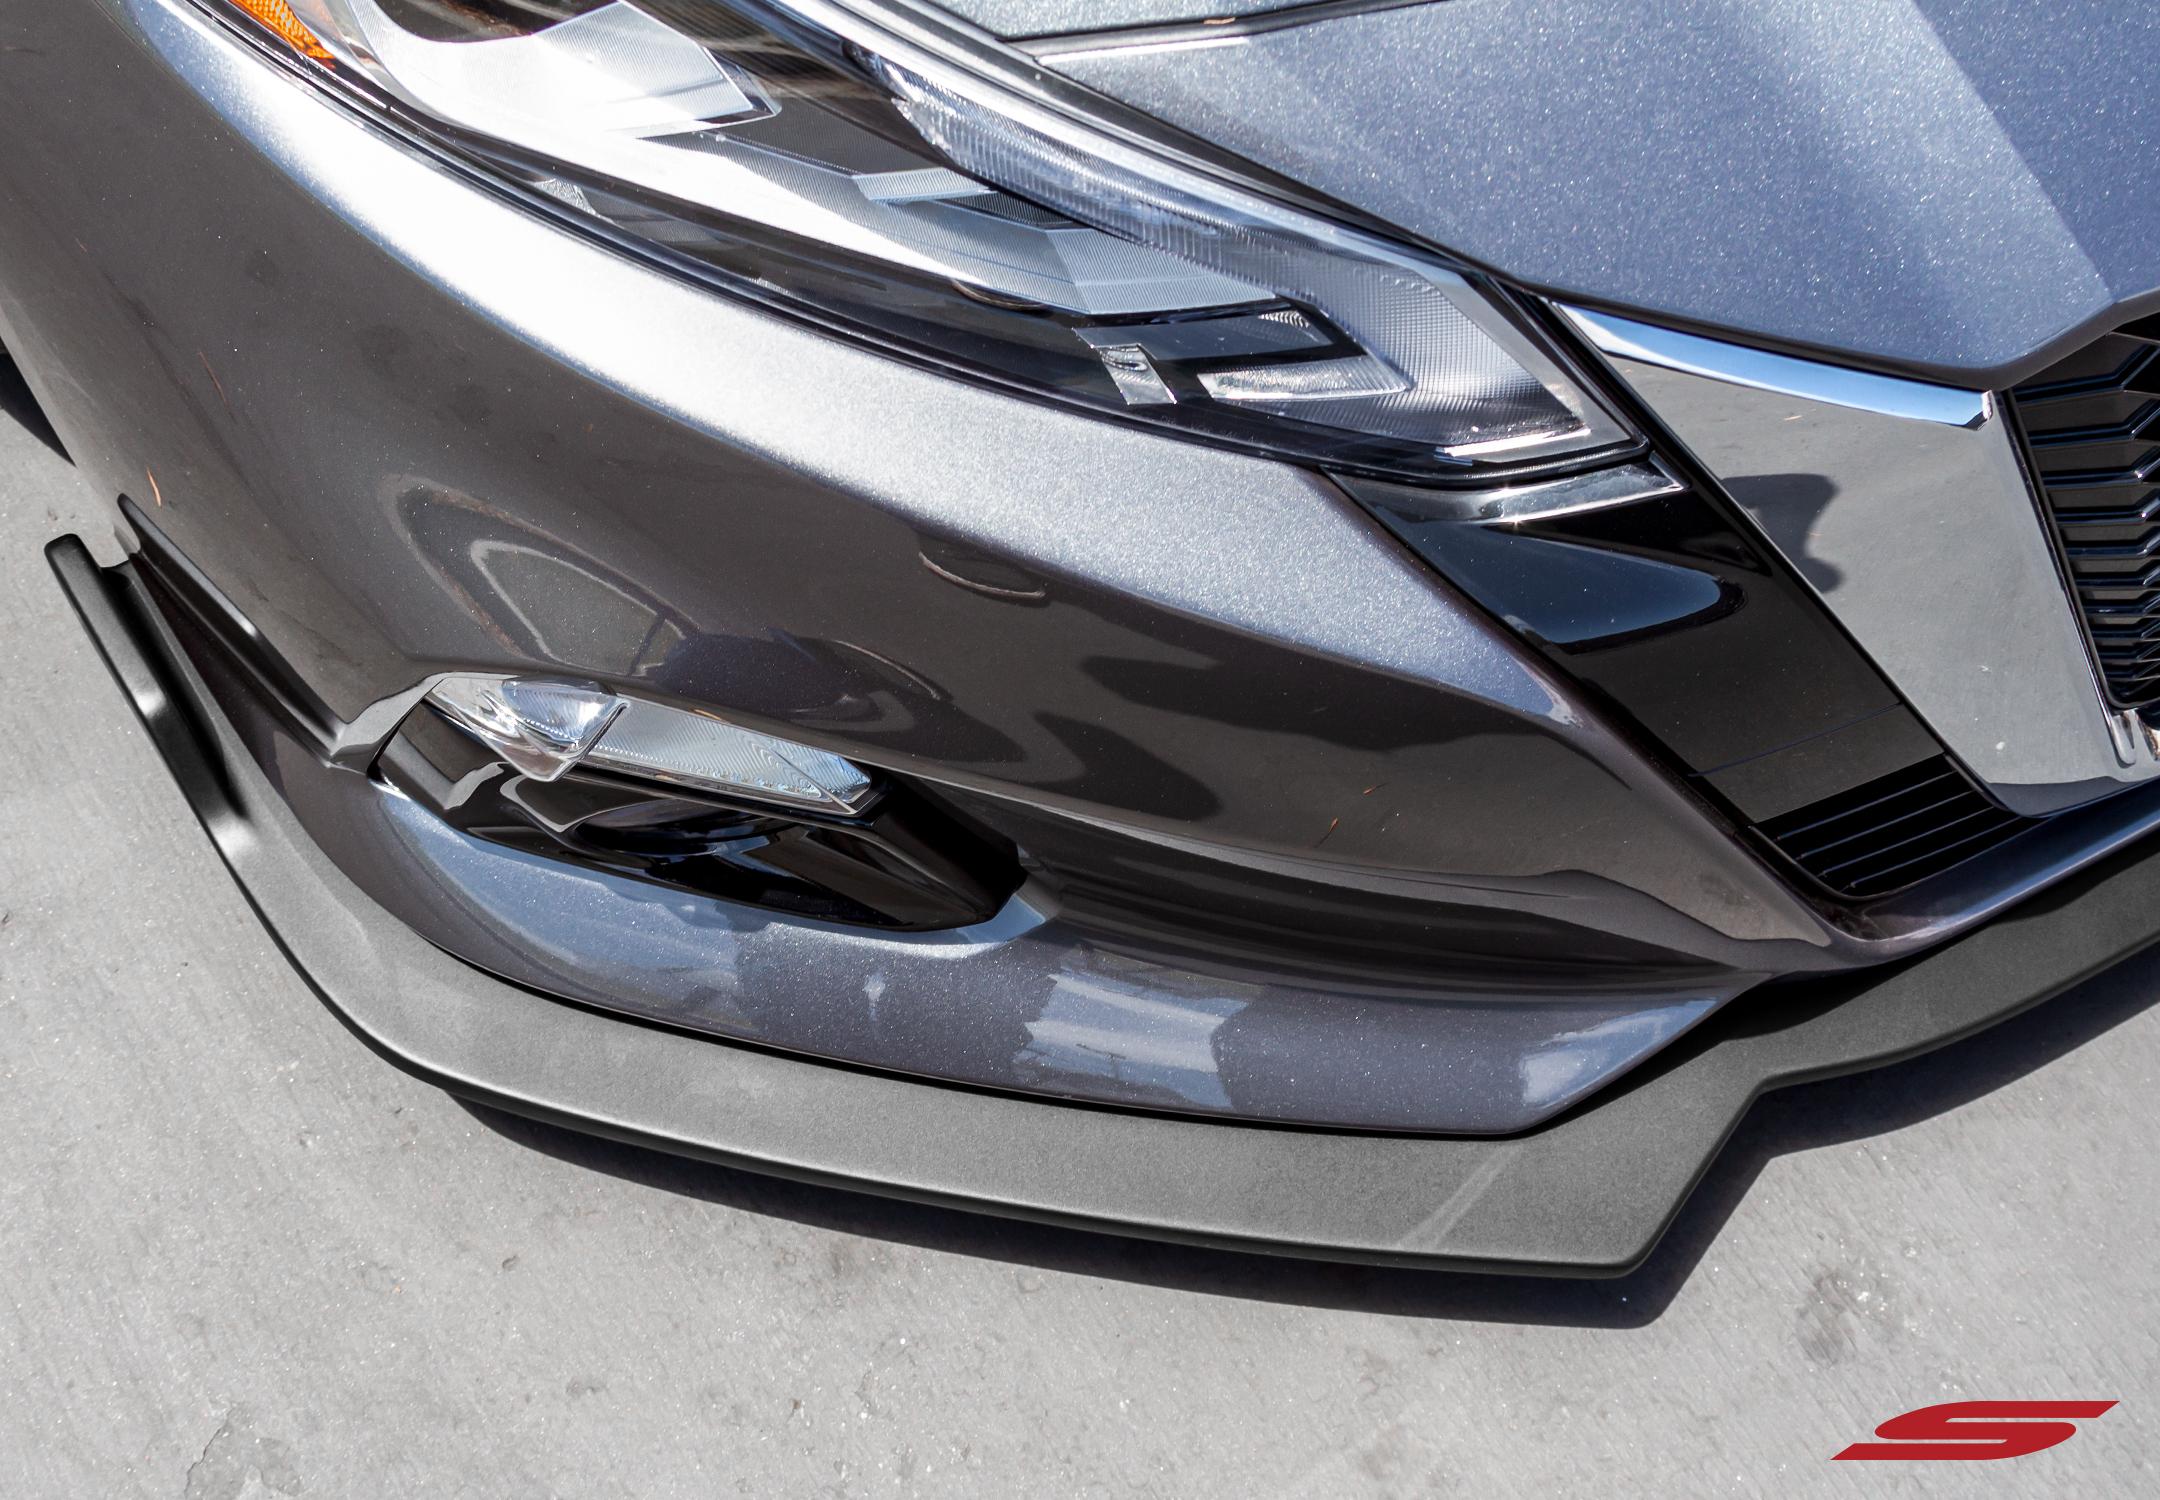 2019+ Nissan Altima STILLEN Front Splitter [Matte Black] - KB13153